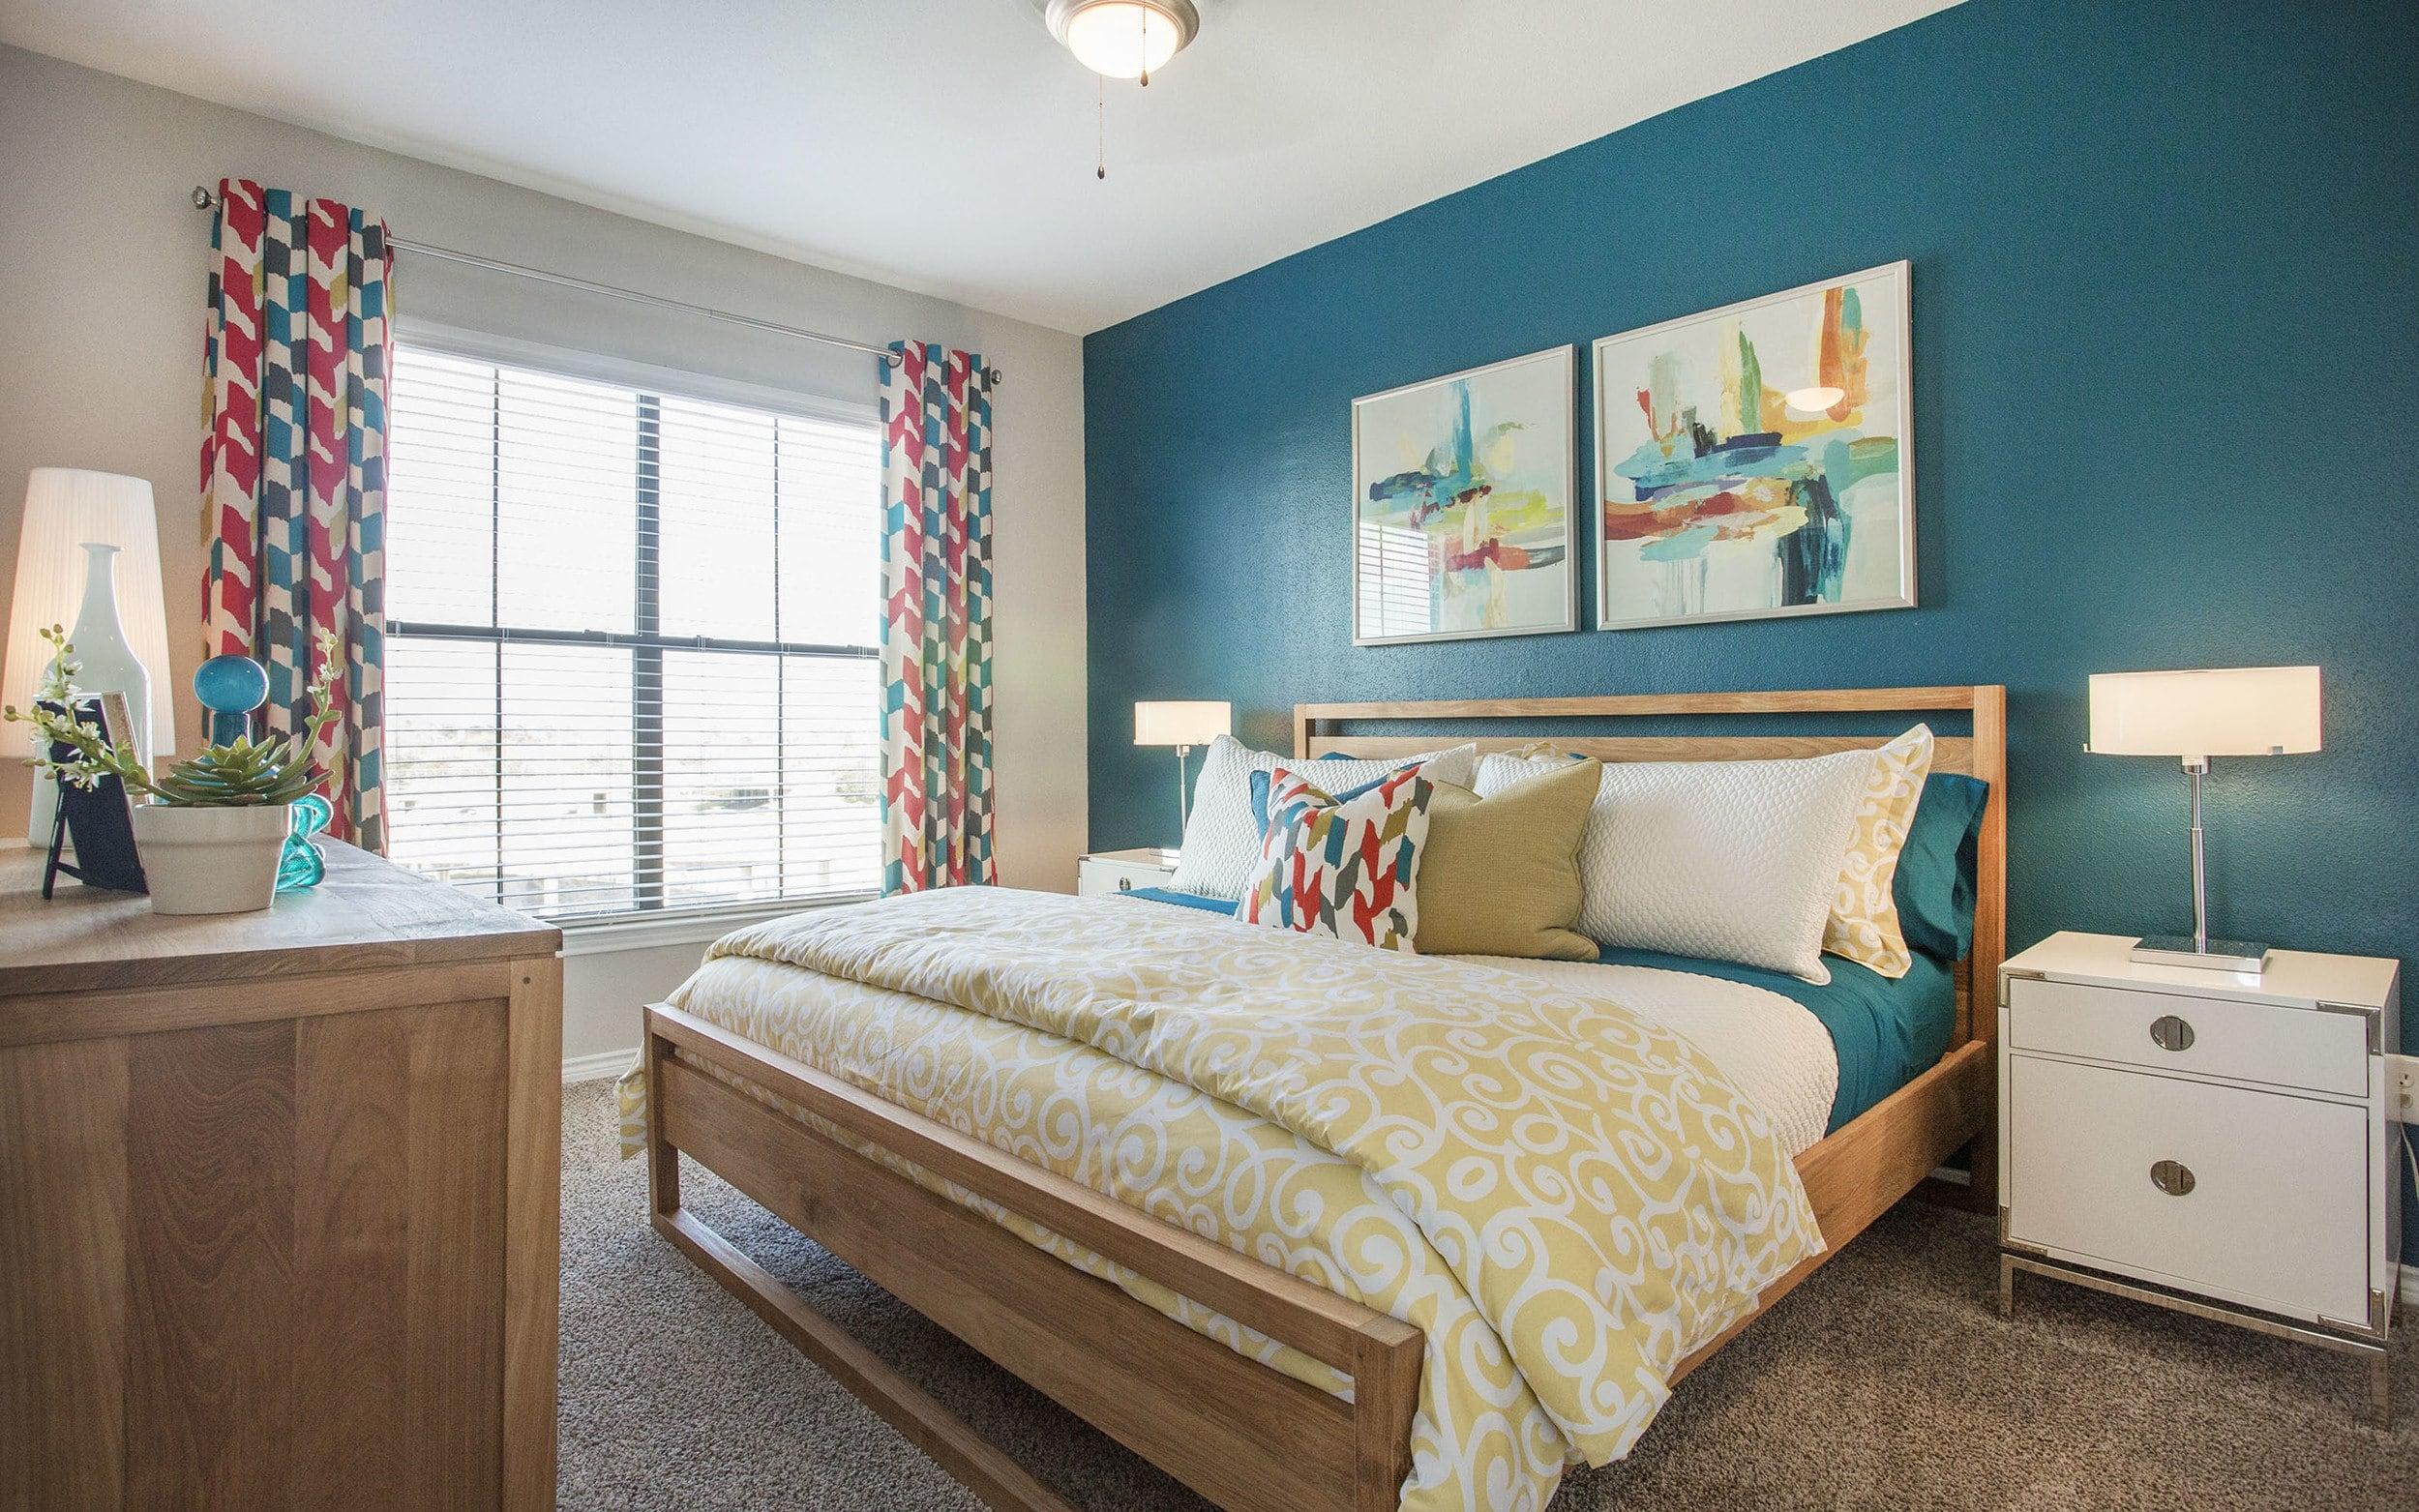 Bedroom at Verdir at Hermann Park in Houston, Texas